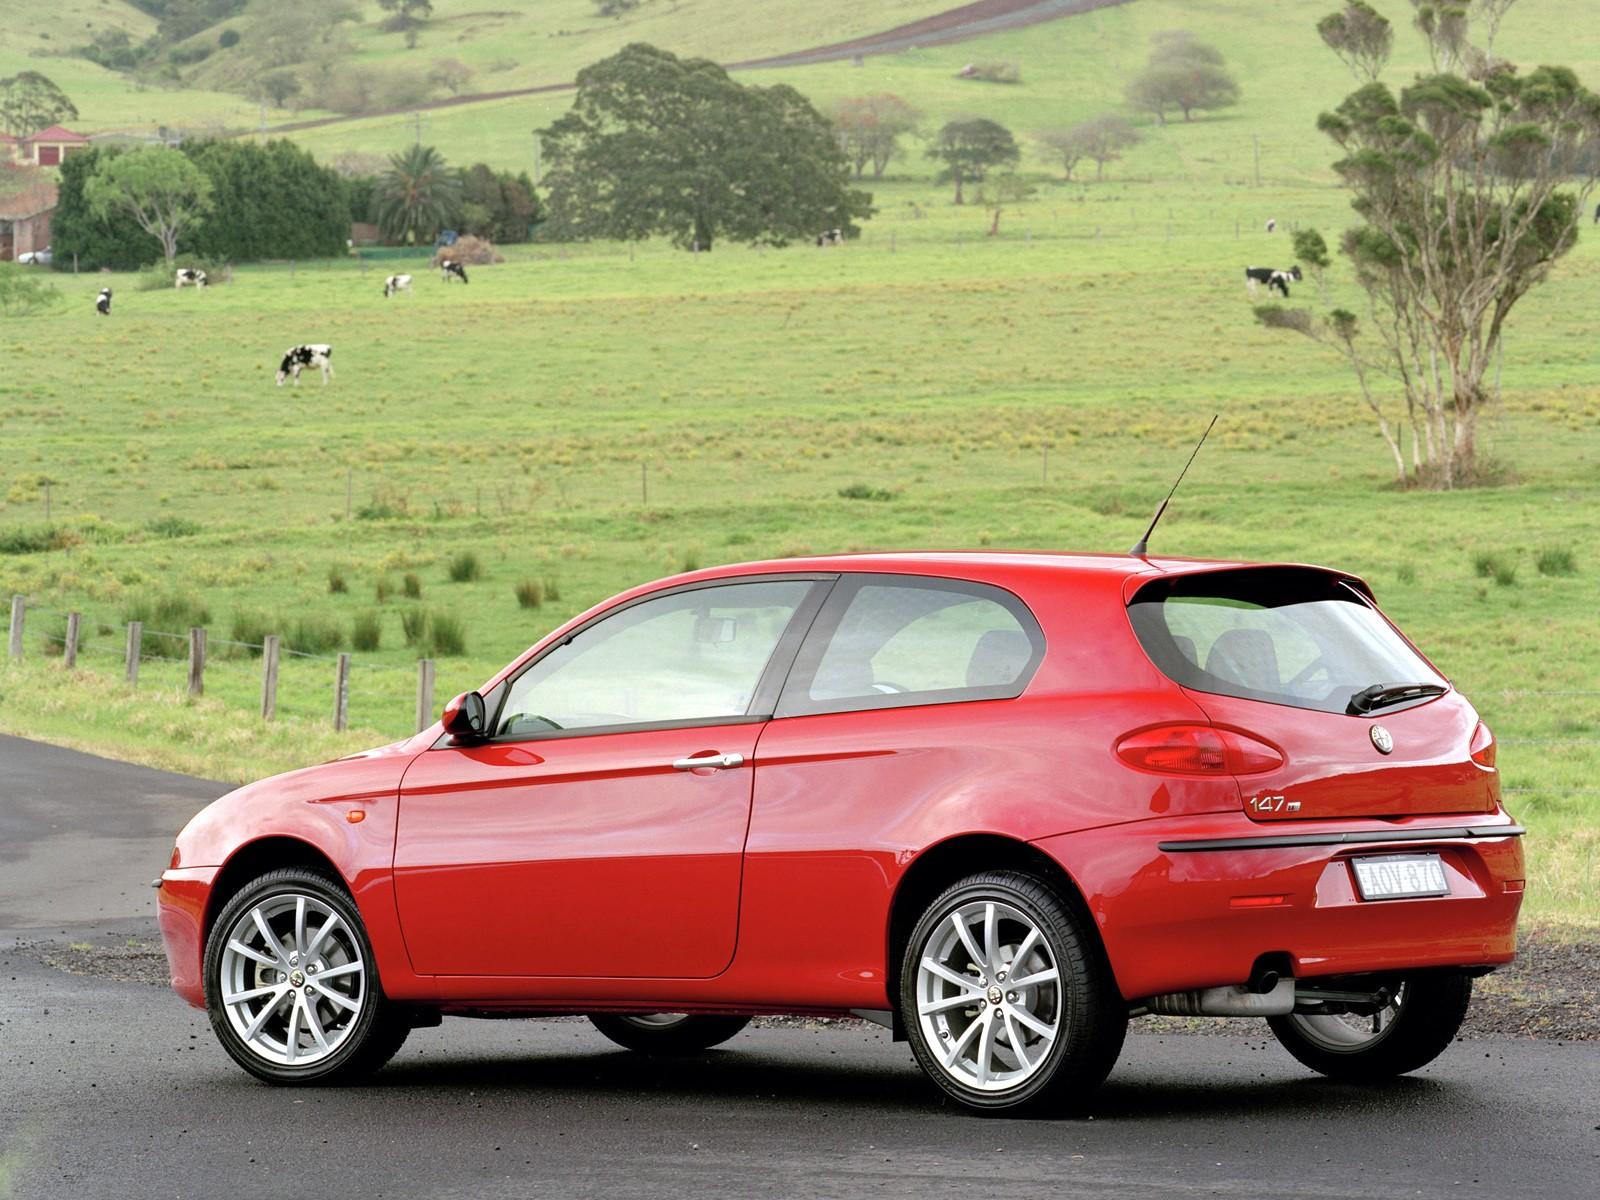 alfa romeo 147 3 doors specs 2000 2001 2002 2003 2004 2005 autoevolution. Black Bedroom Furniture Sets. Home Design Ideas